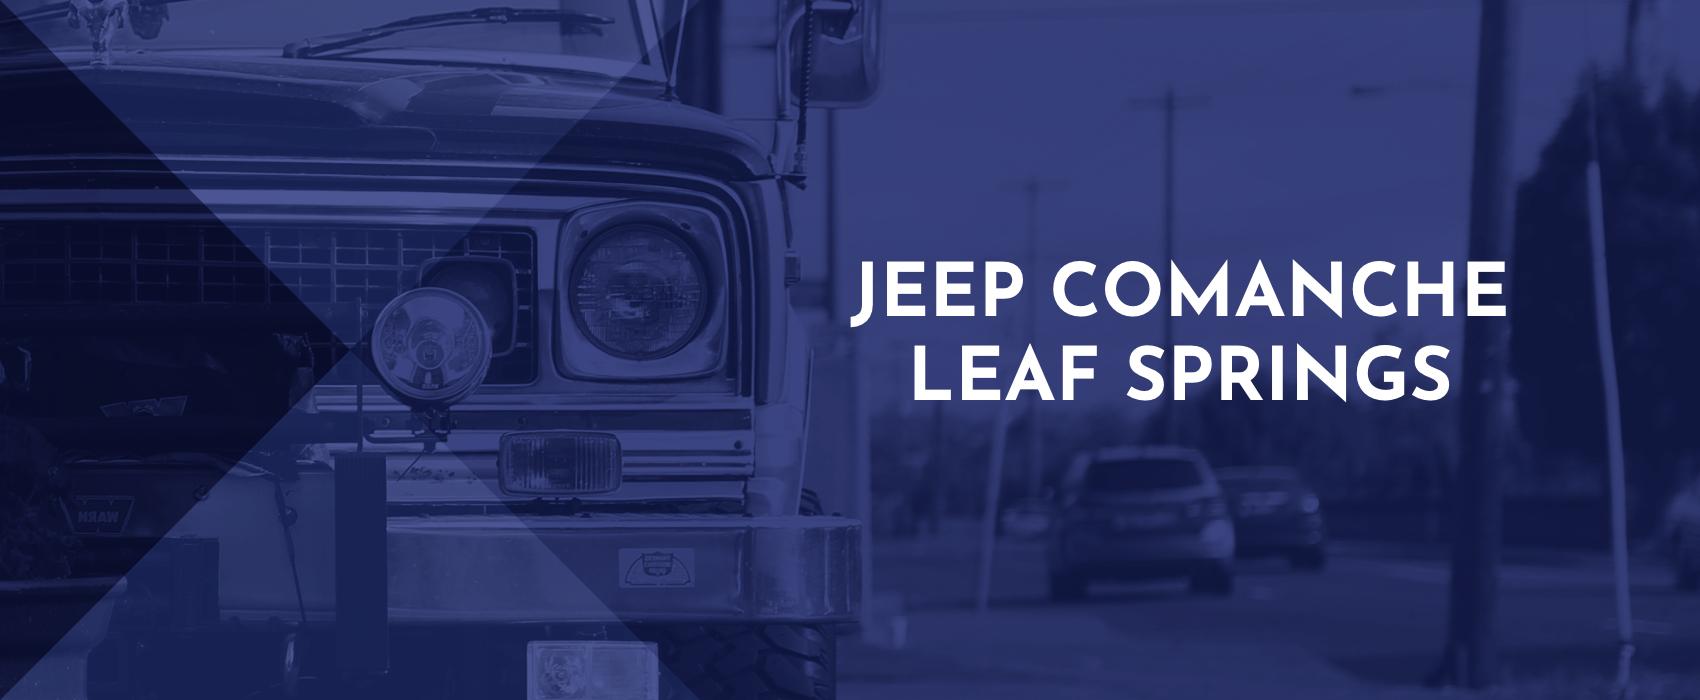 01-jeep-comanche-leaf-springs.jpg